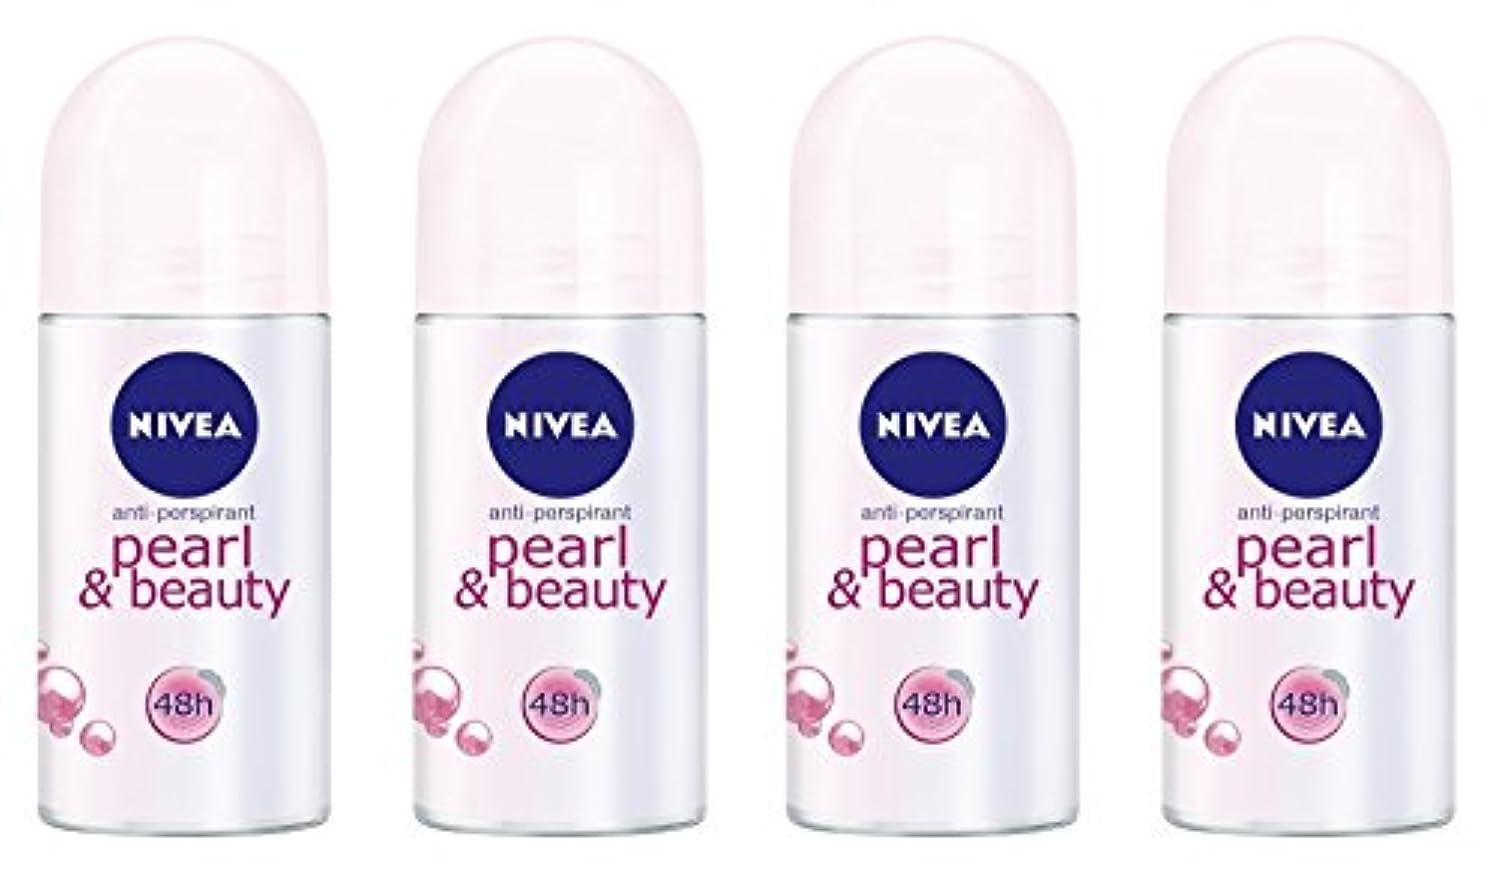 (Pack of 4) Nivea Pearl & Beauty Anti-perspirant Deodorant Roll On for Women 4x50ml - (4パック) ニベアパールそしてビューティー制汗剤...